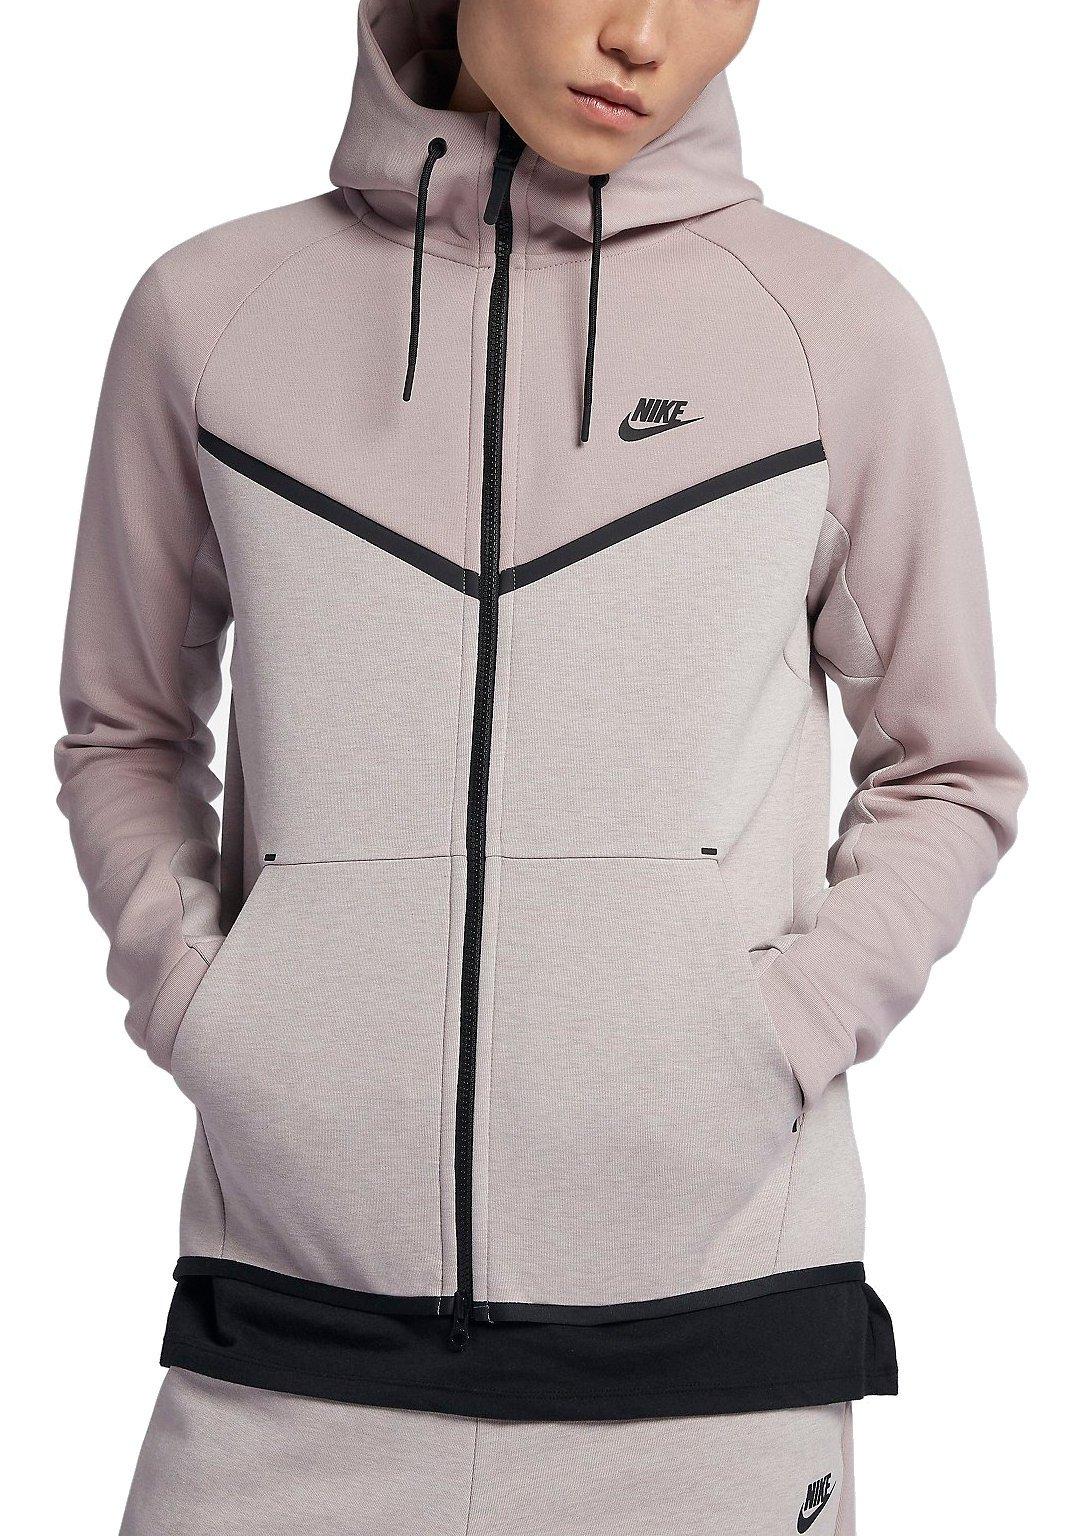 Vacilar Caliza telar  Hooded sweatshirt Nike M NSW TCH FLC WR HOODIE FZ CB - Top4Fitness.com